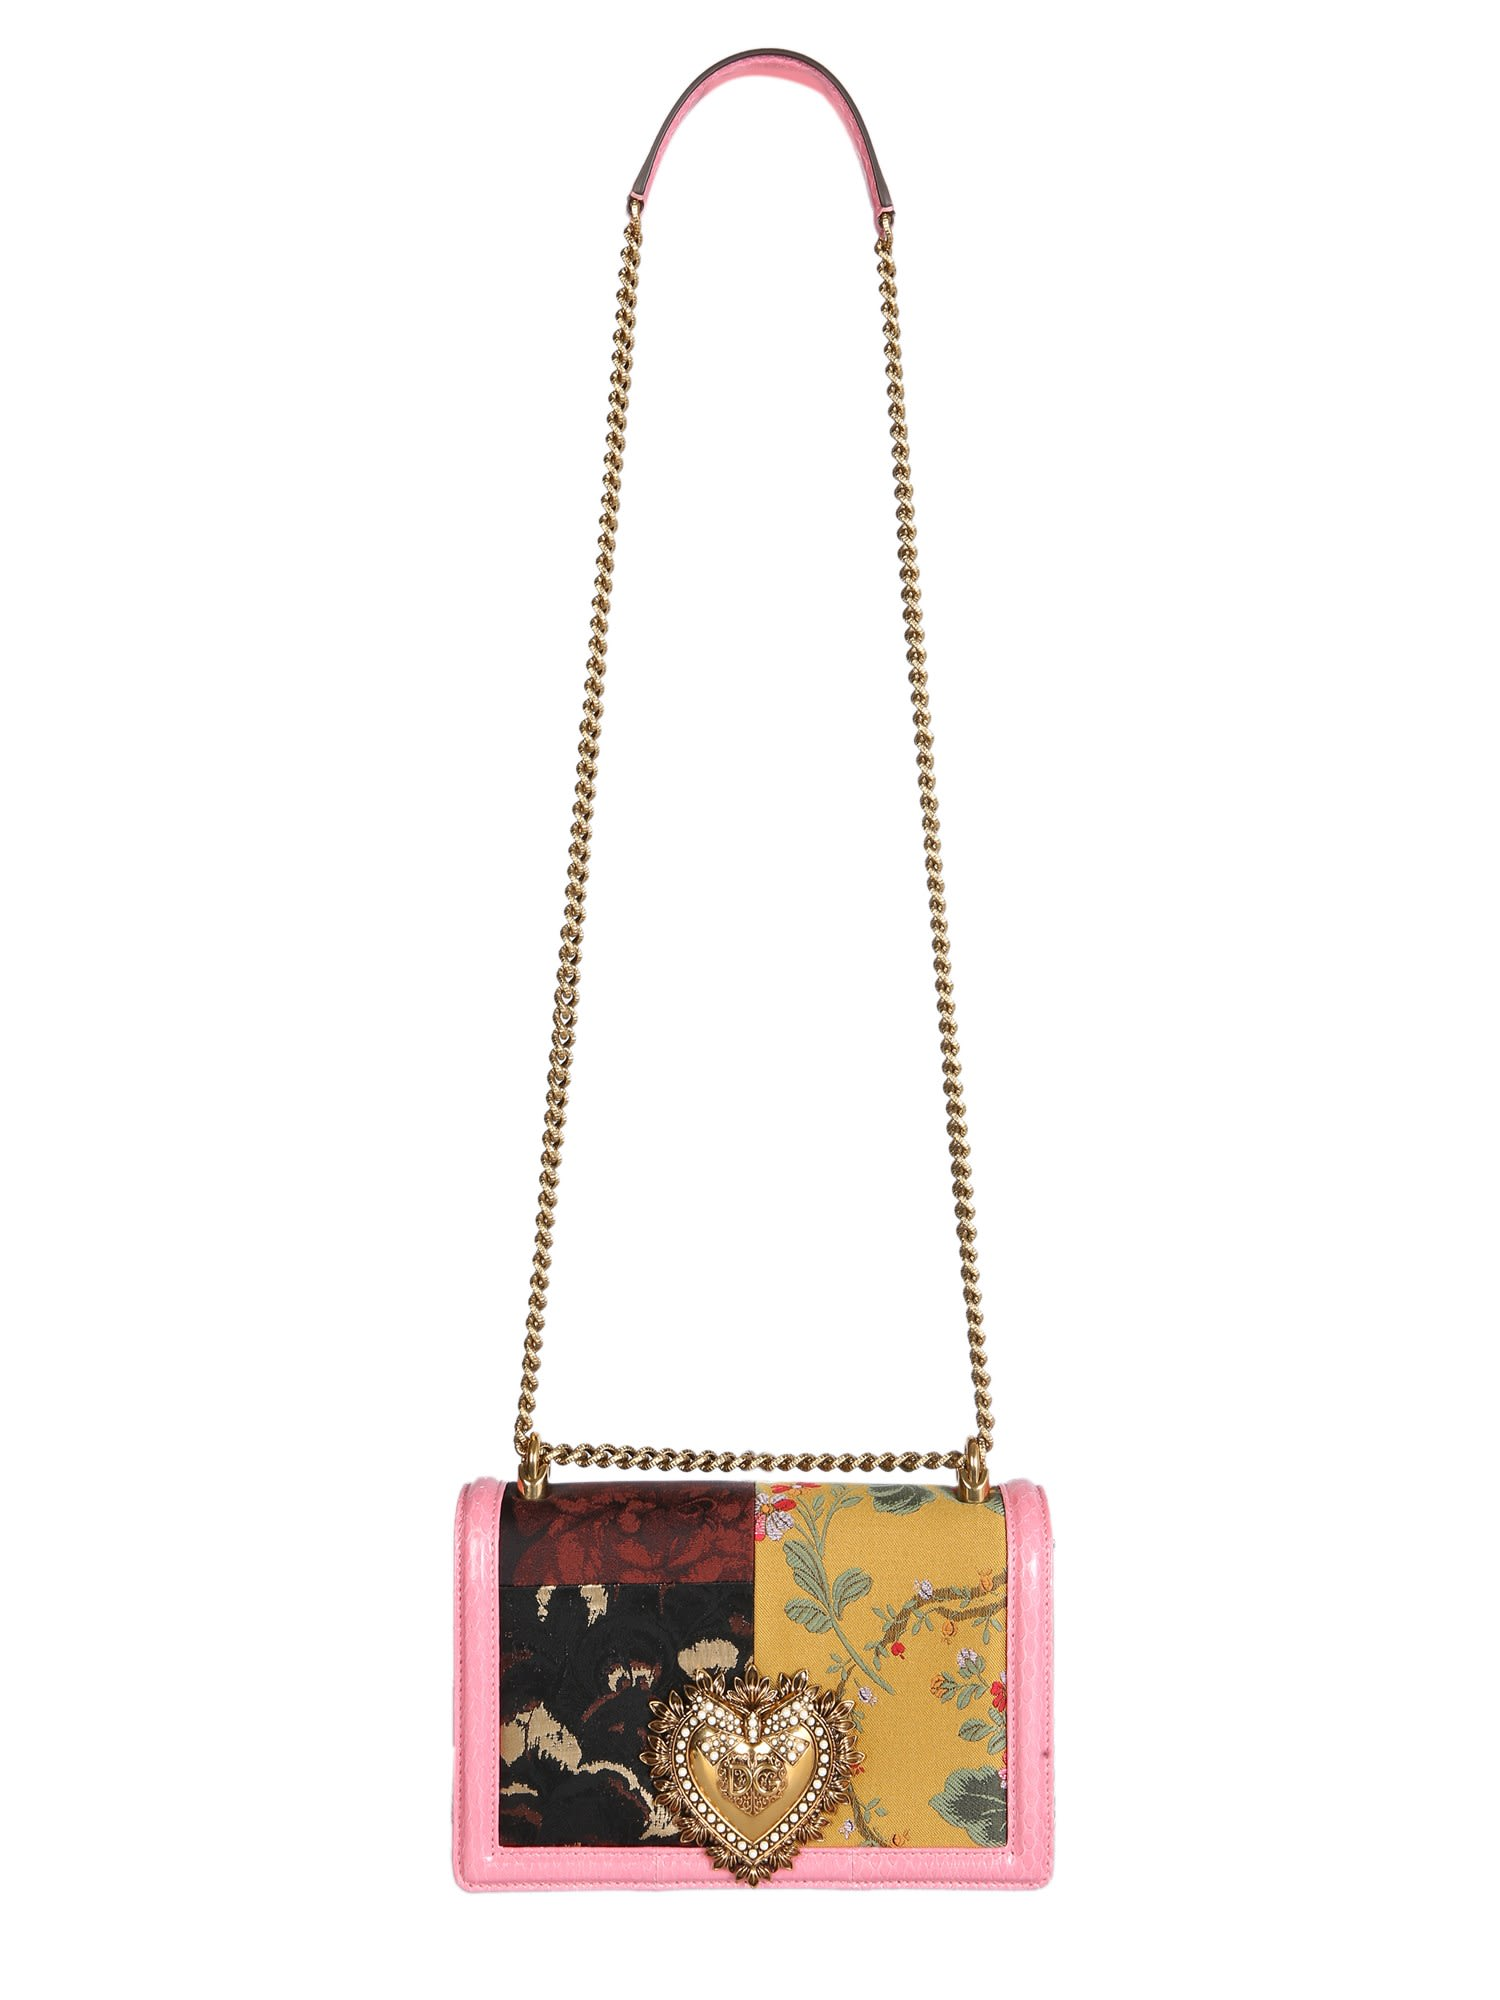 Dolce & Gabbana Leathers MEDIUM DEVOTION BAG